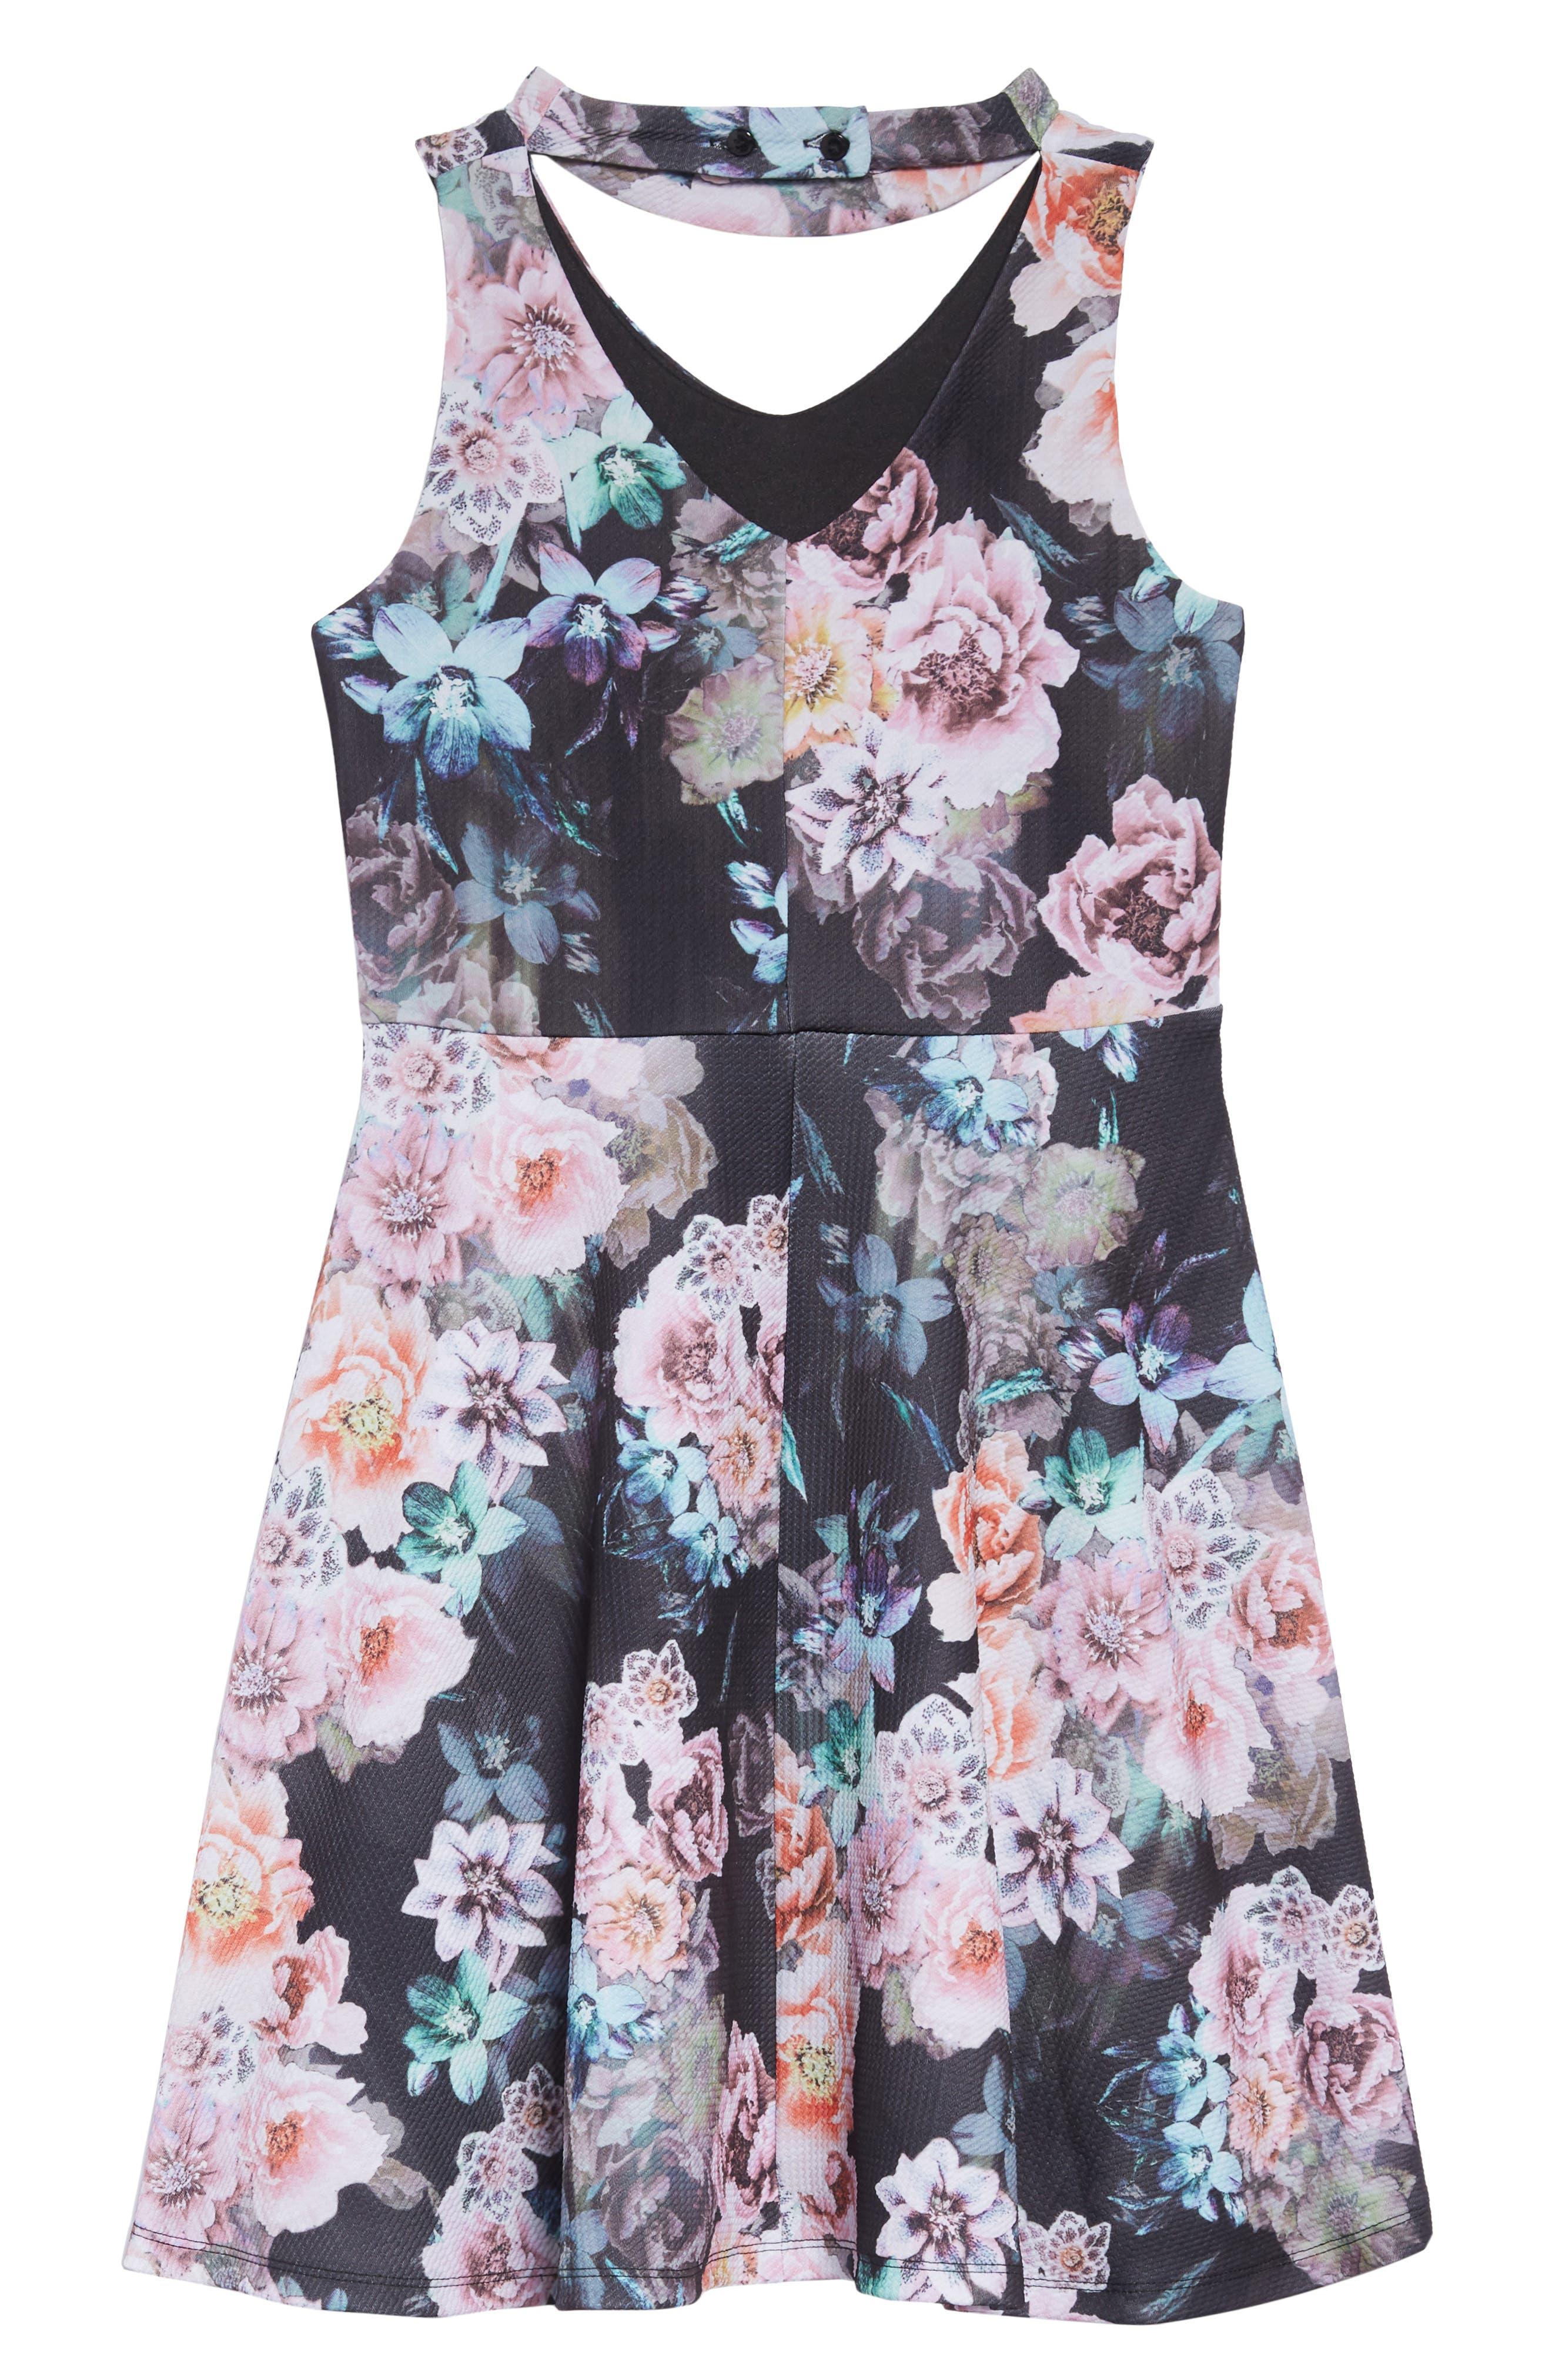 Gigi Floral Skater Dress,                             Alternate thumbnail 2, color,                             BLACK